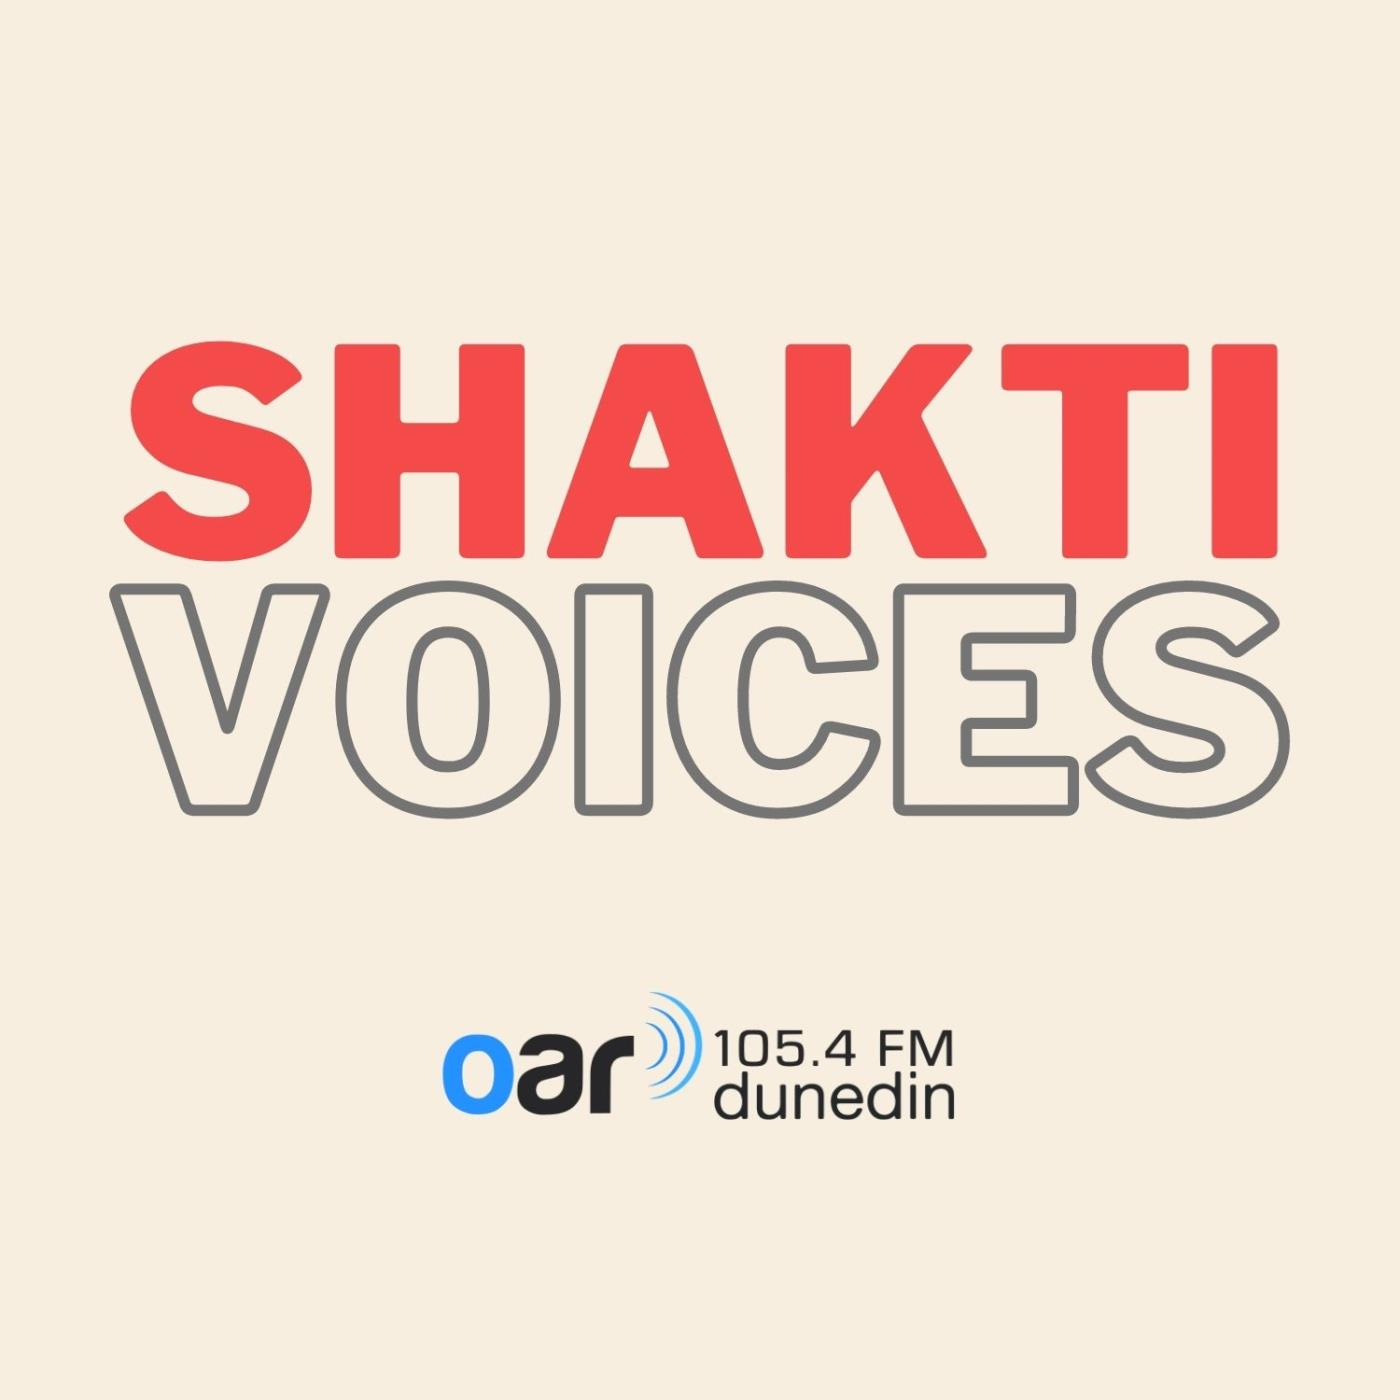 Shakti Voices